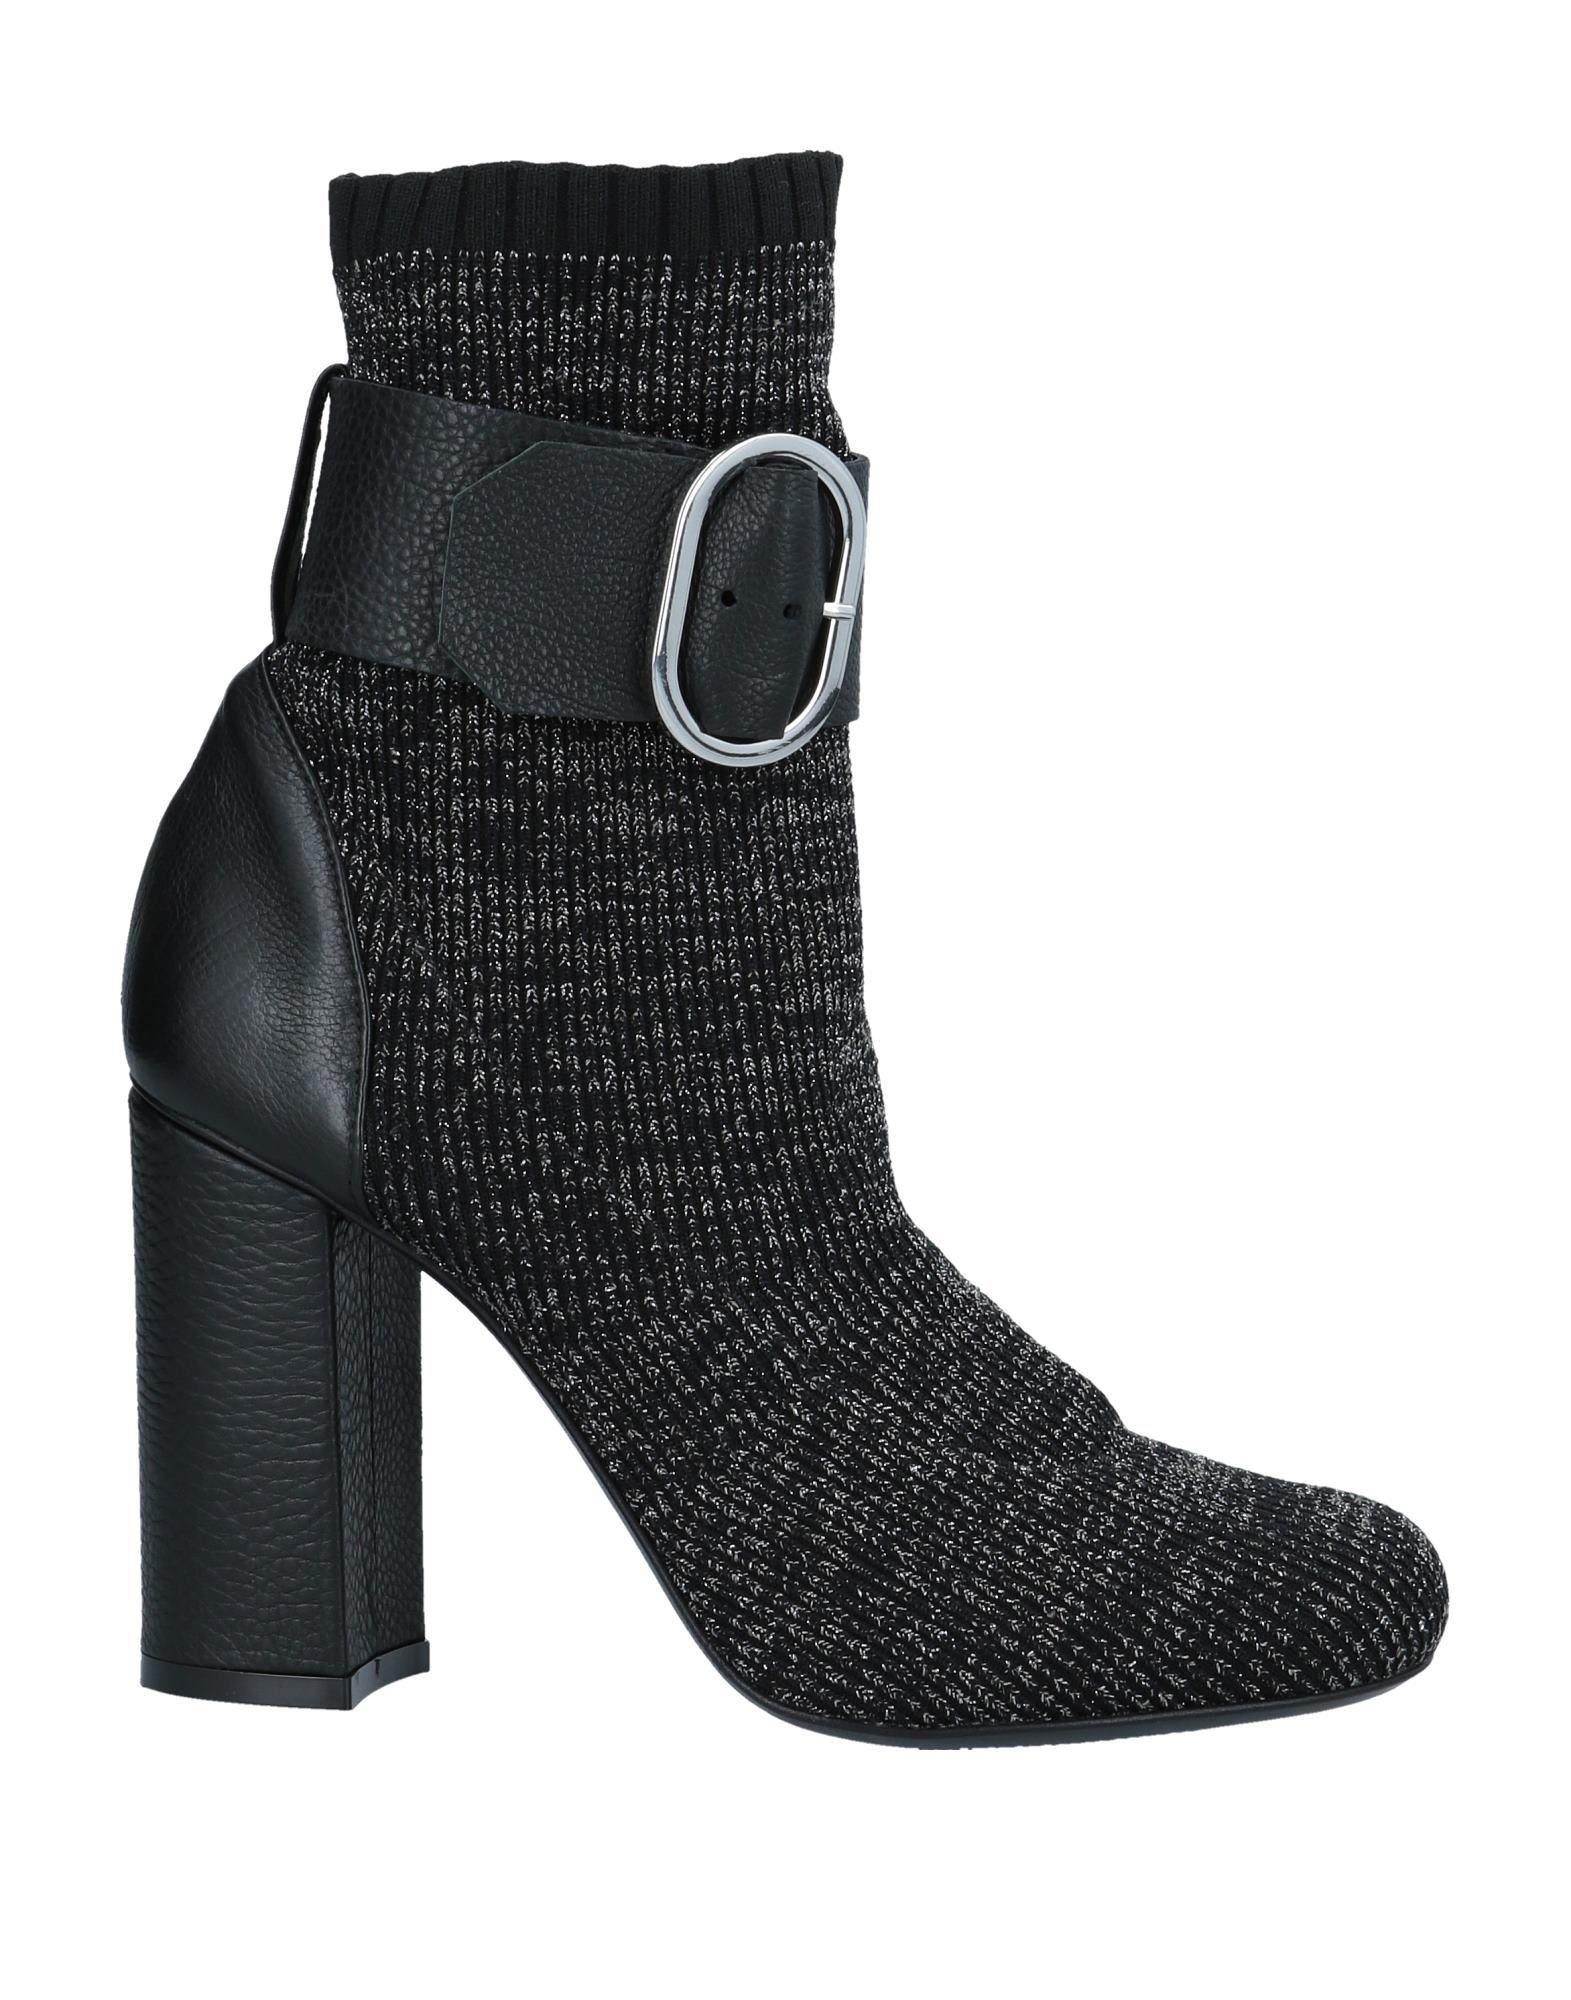 Stilvolle billige Stiefelette Schuhe Fiorifrancesi Stiefelette billige Damen  11550299TI f8dc0e